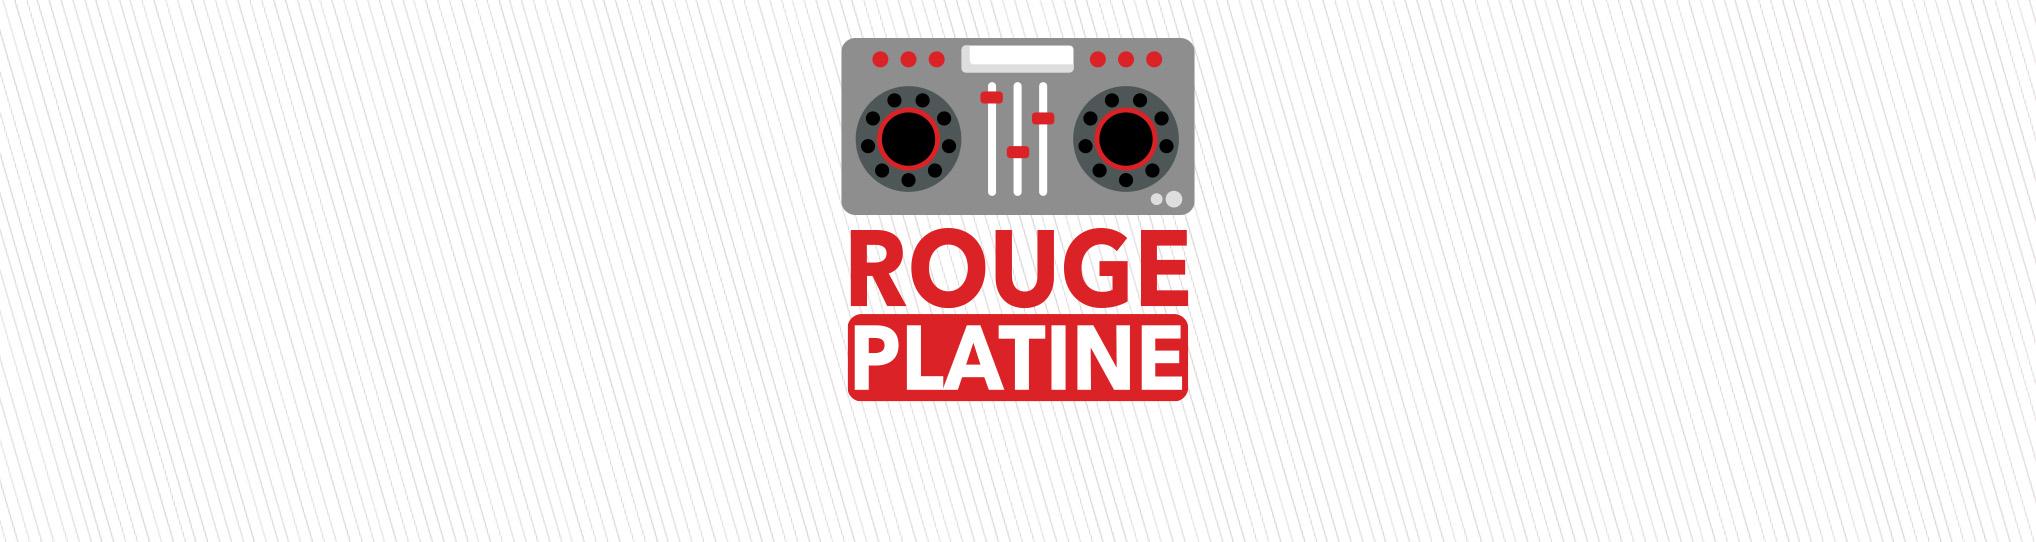 Rouge FM | Rouge Platine